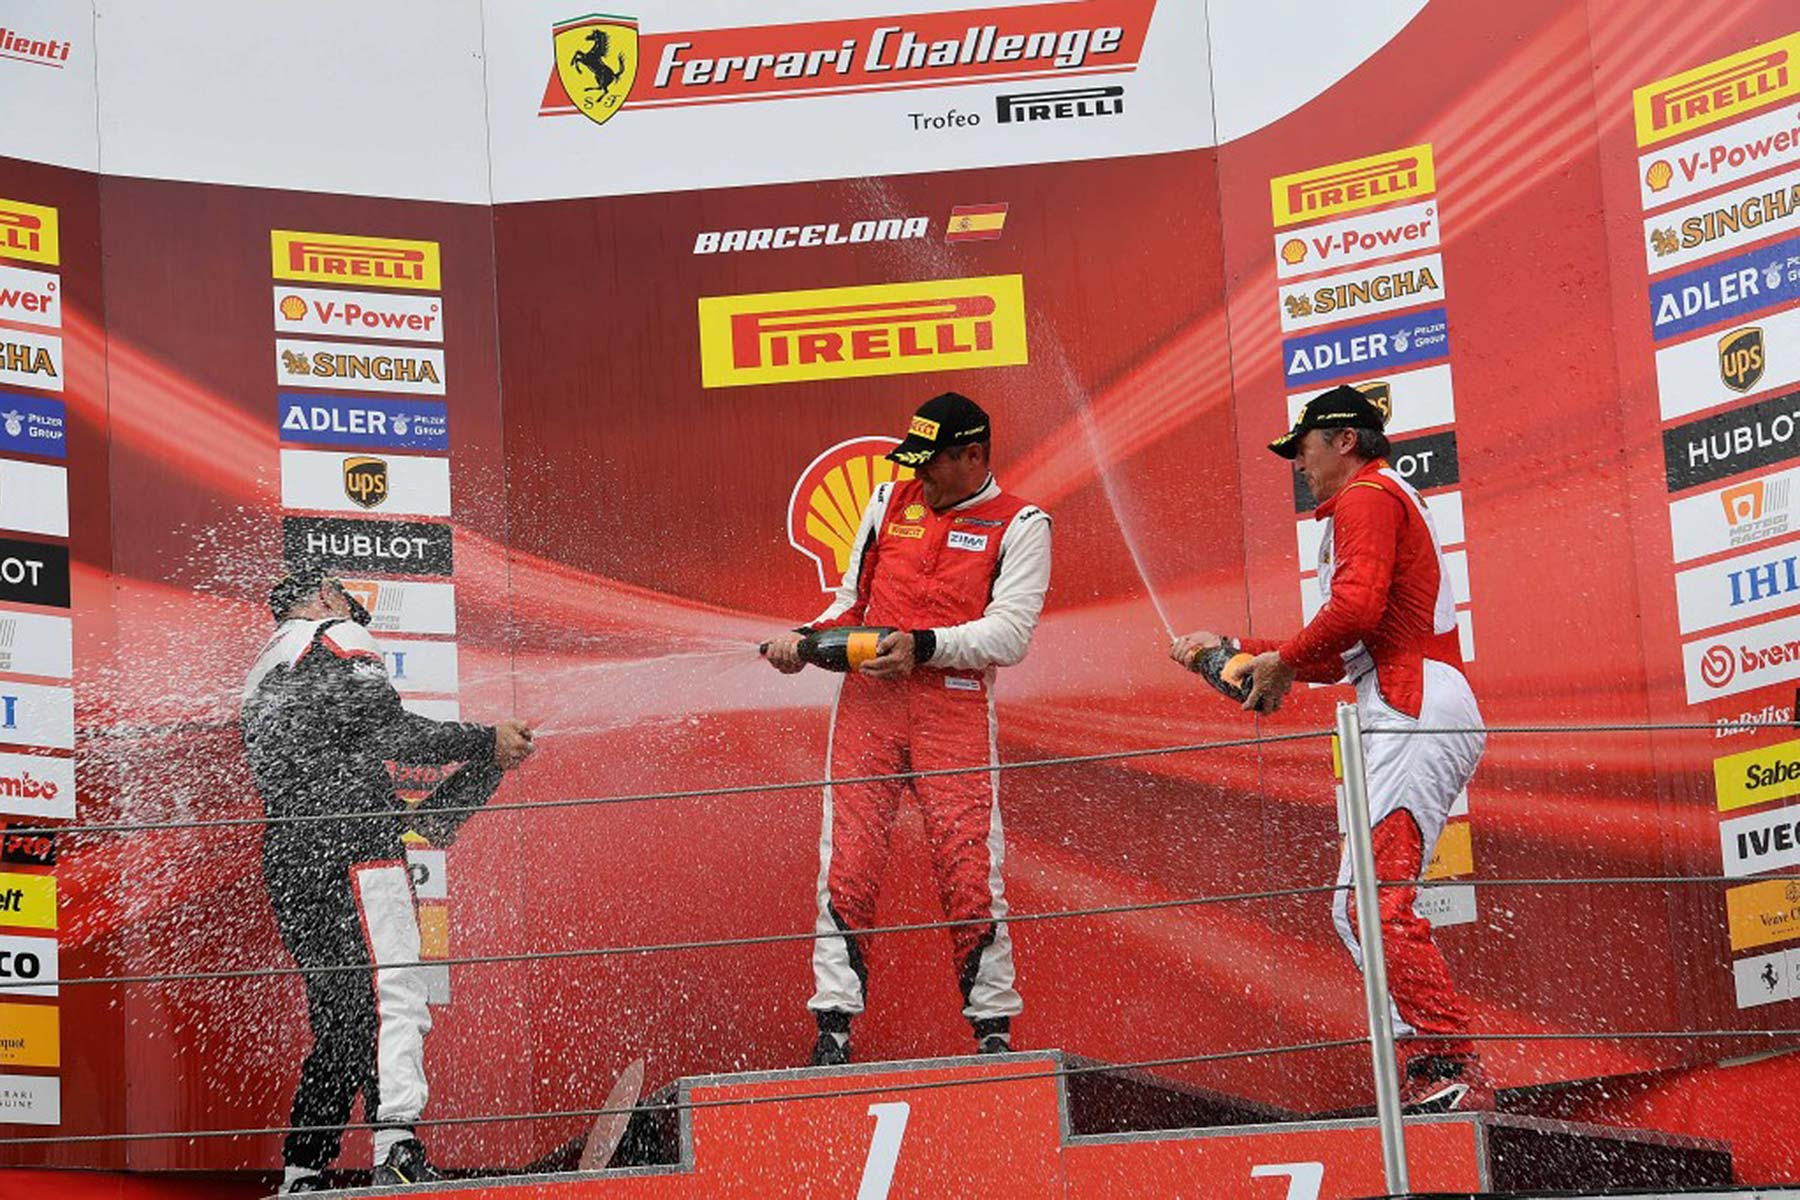 Ferrari Challenge UK race series